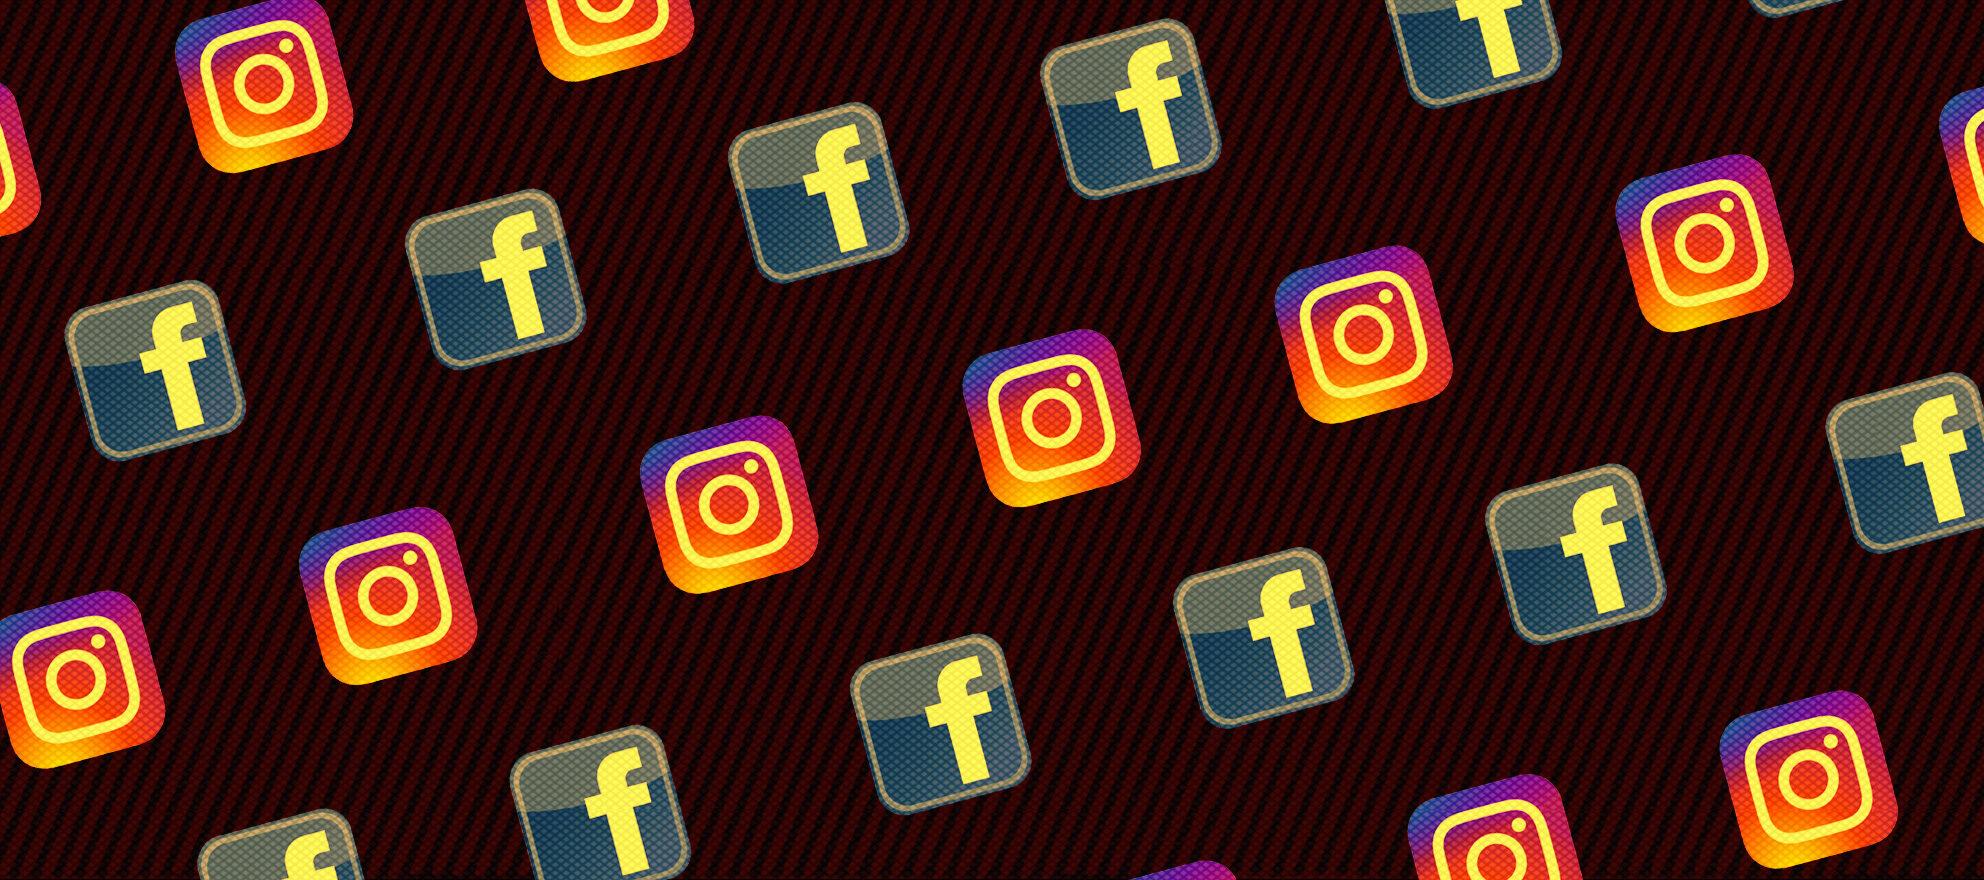 30+ free hacks for Instagram and Facebook